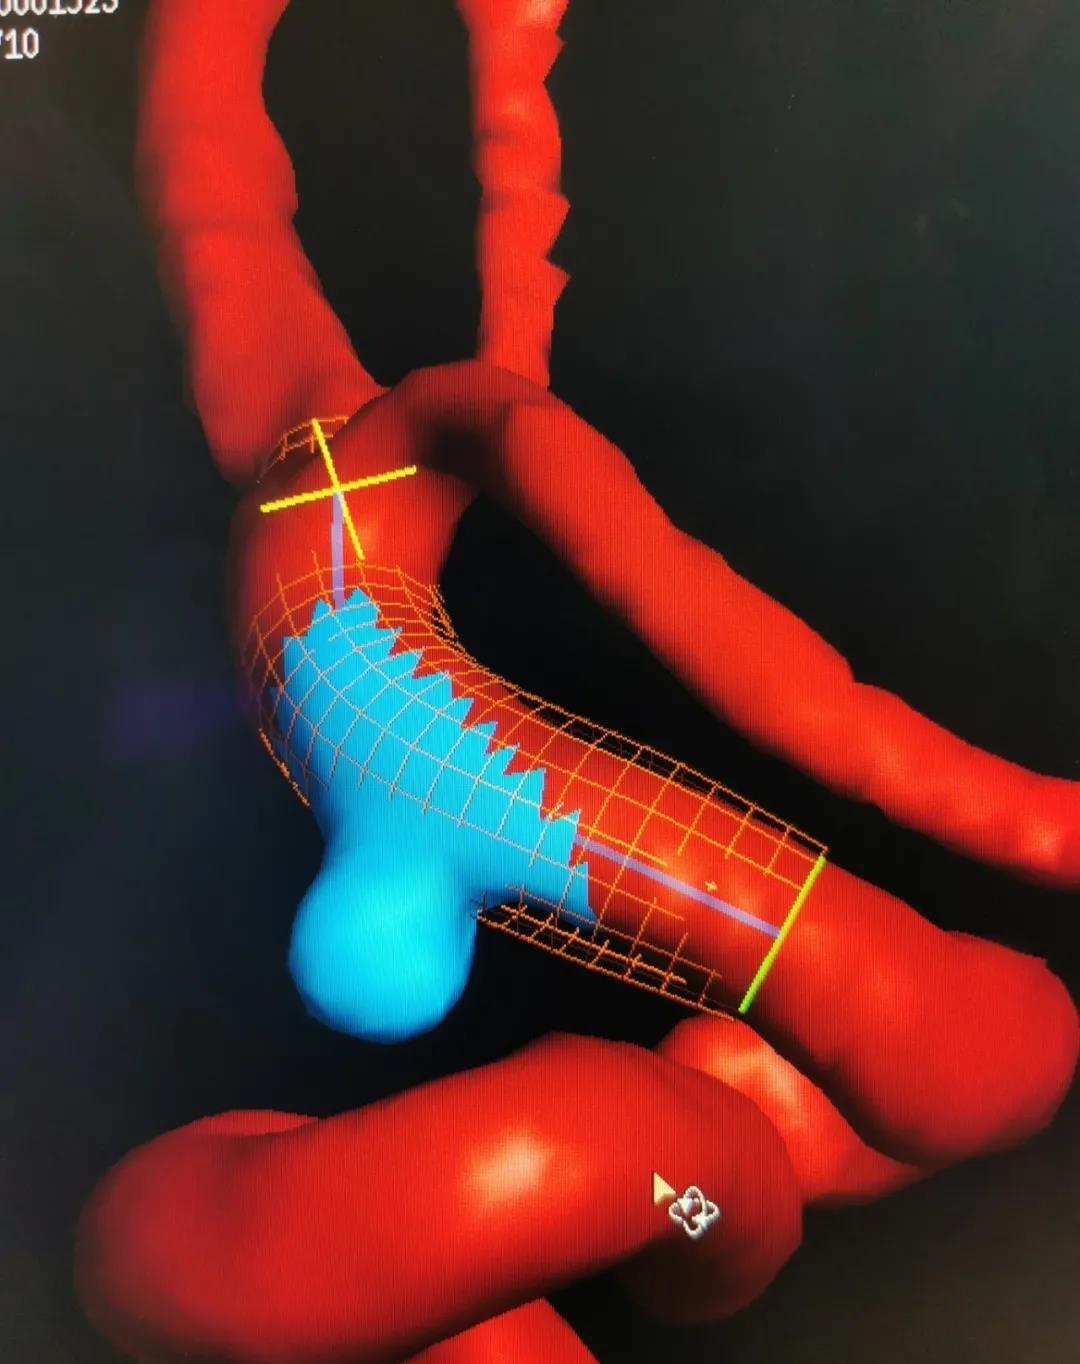 3 D 血管成像科学导航大脑「排雷」快准稳